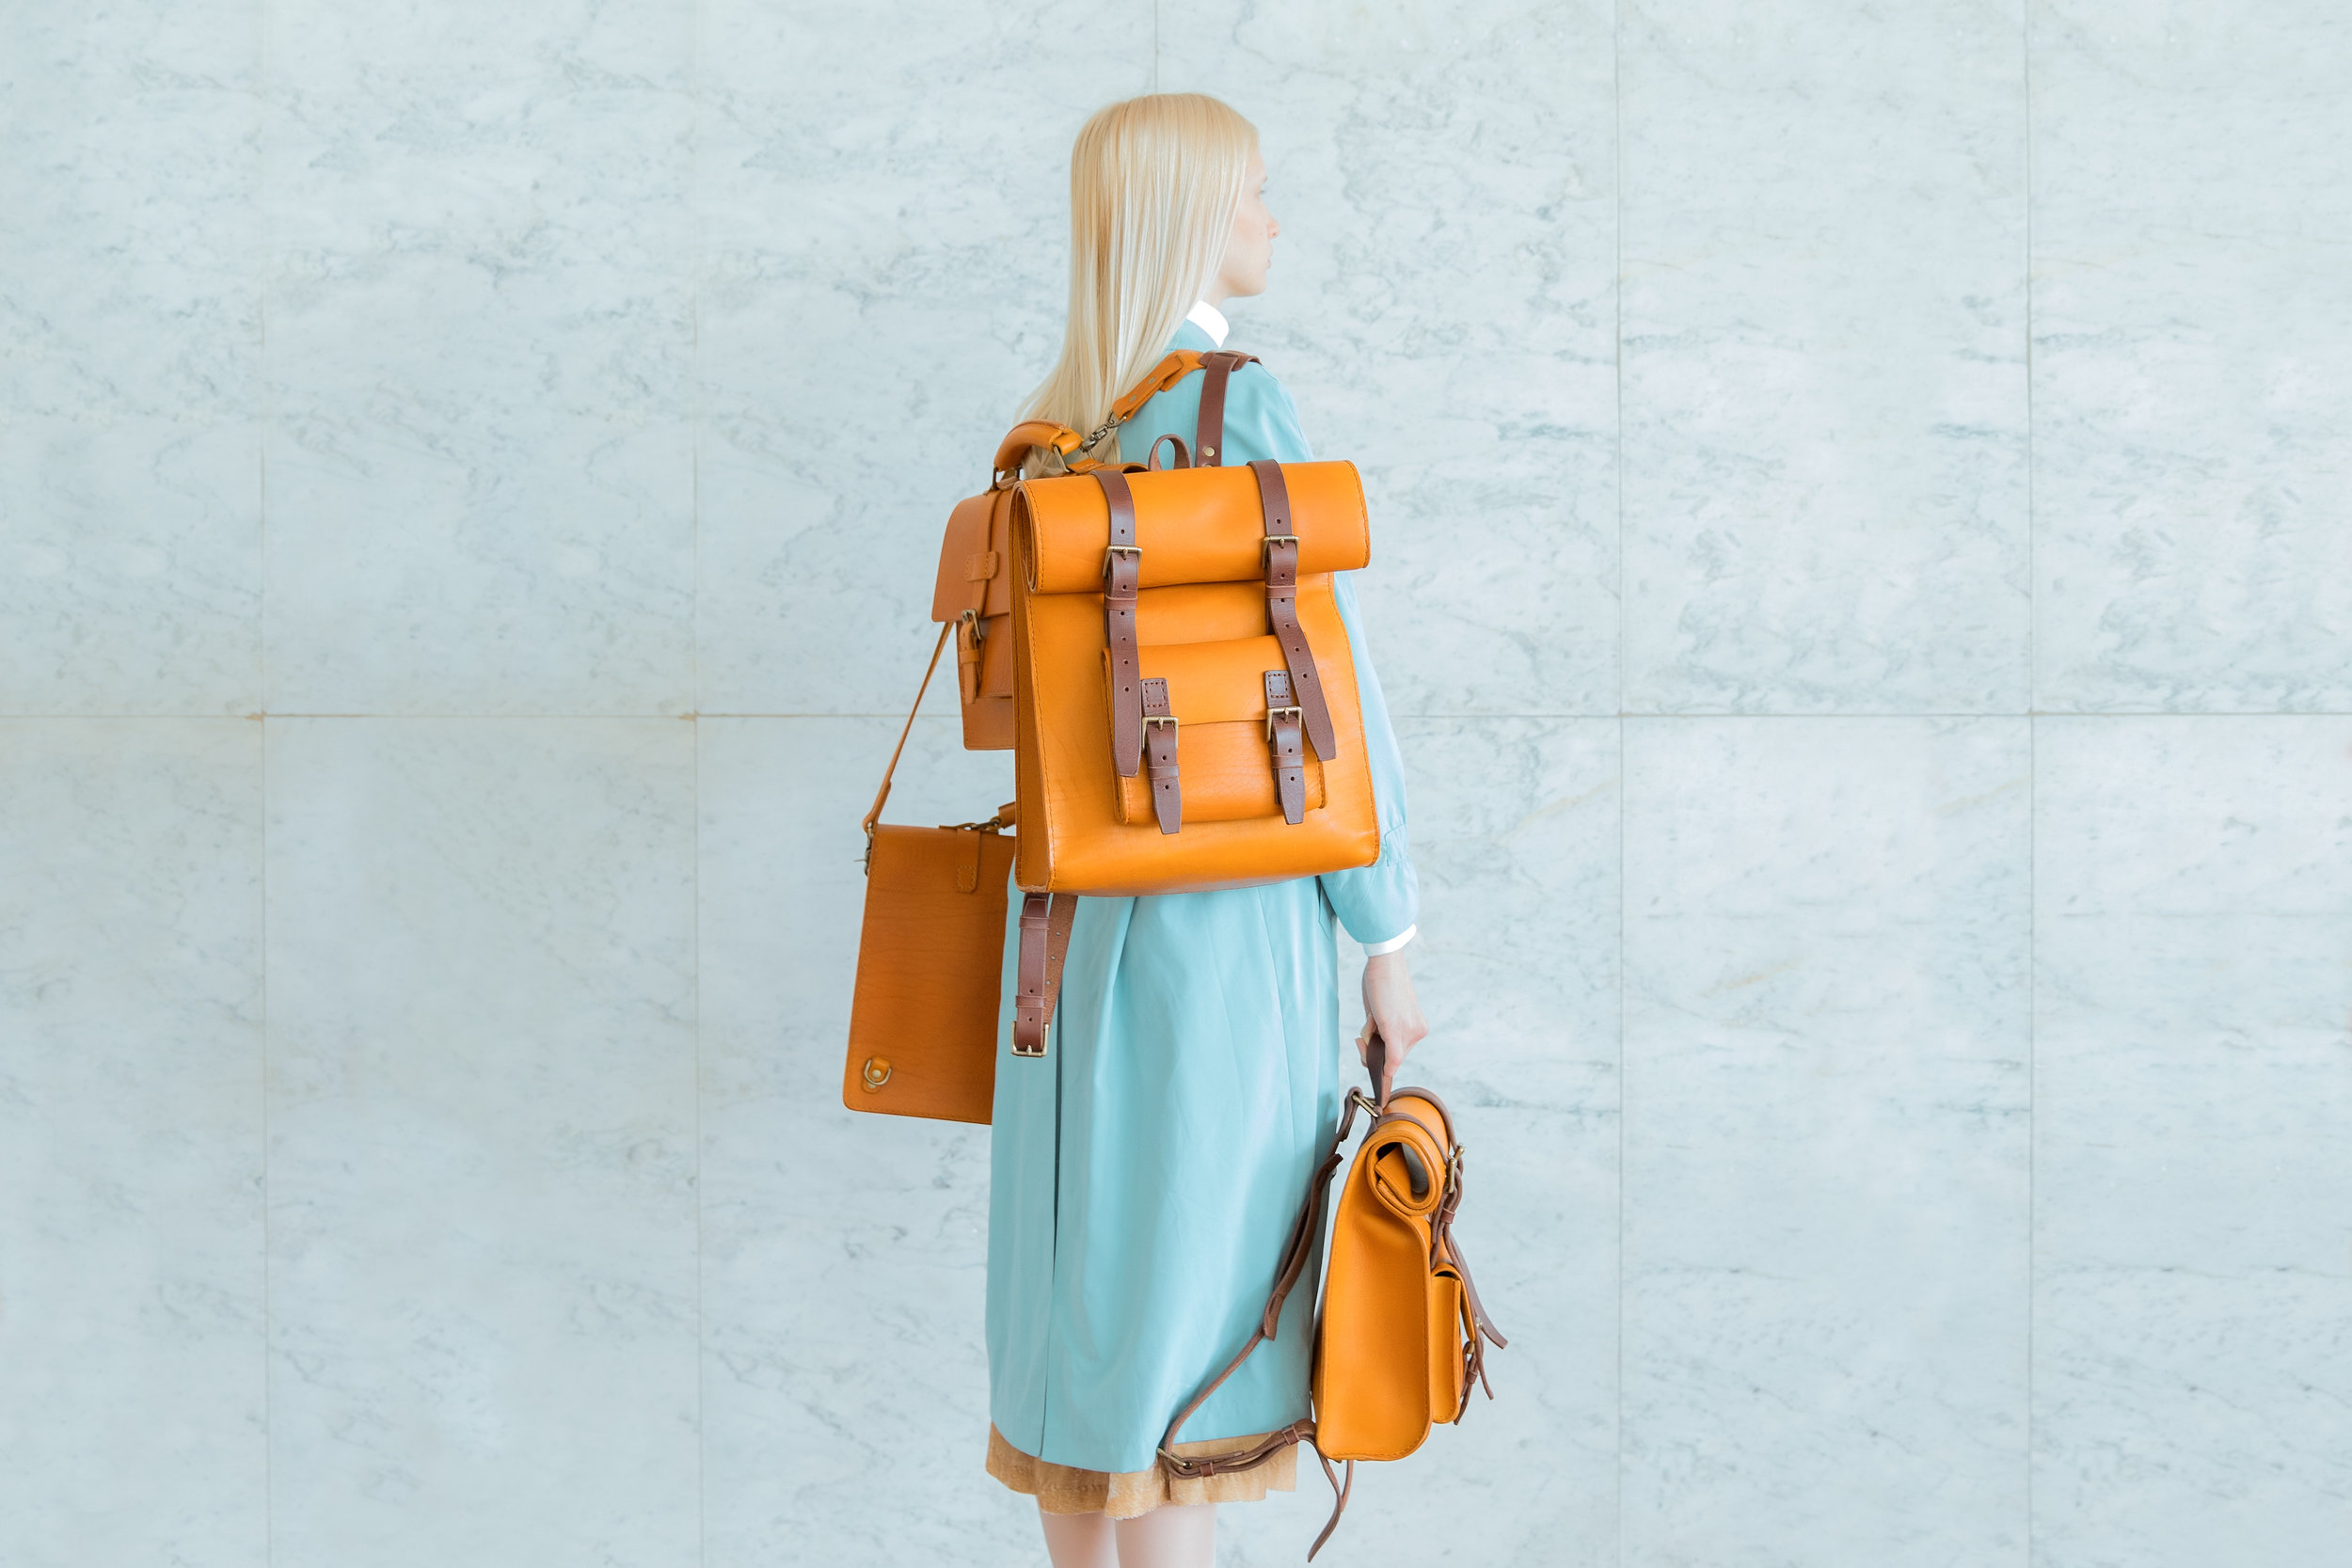 Mária Švarbová photo of model with saddle stitched bags